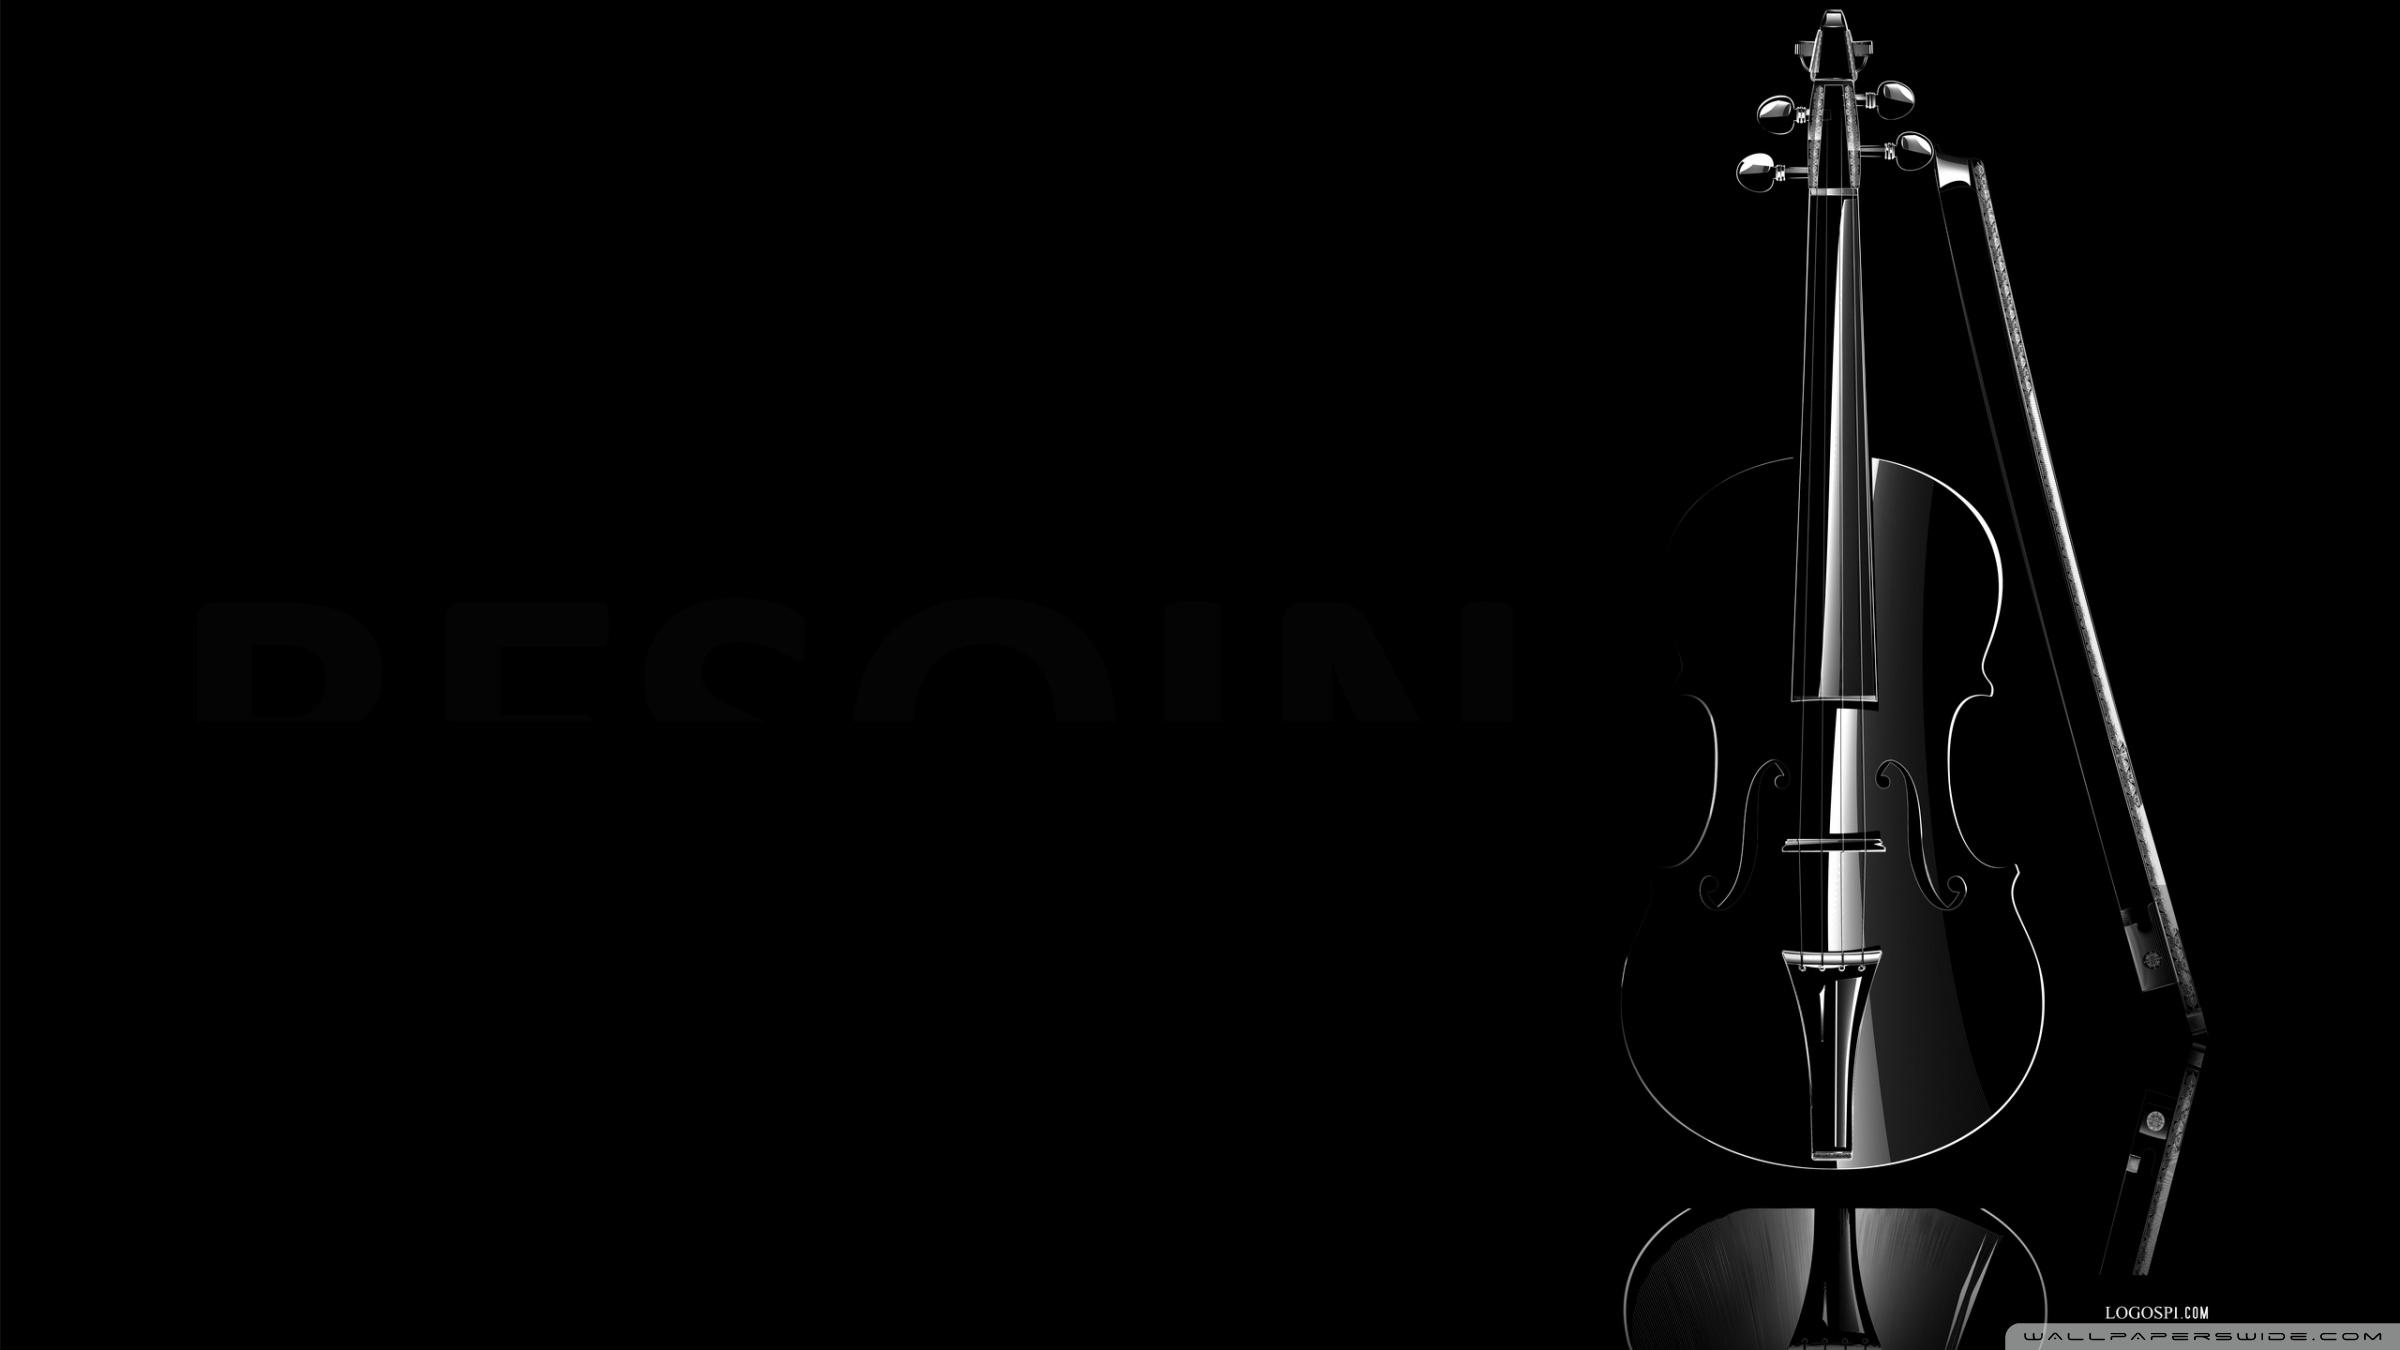 Violin Wallpaper HD